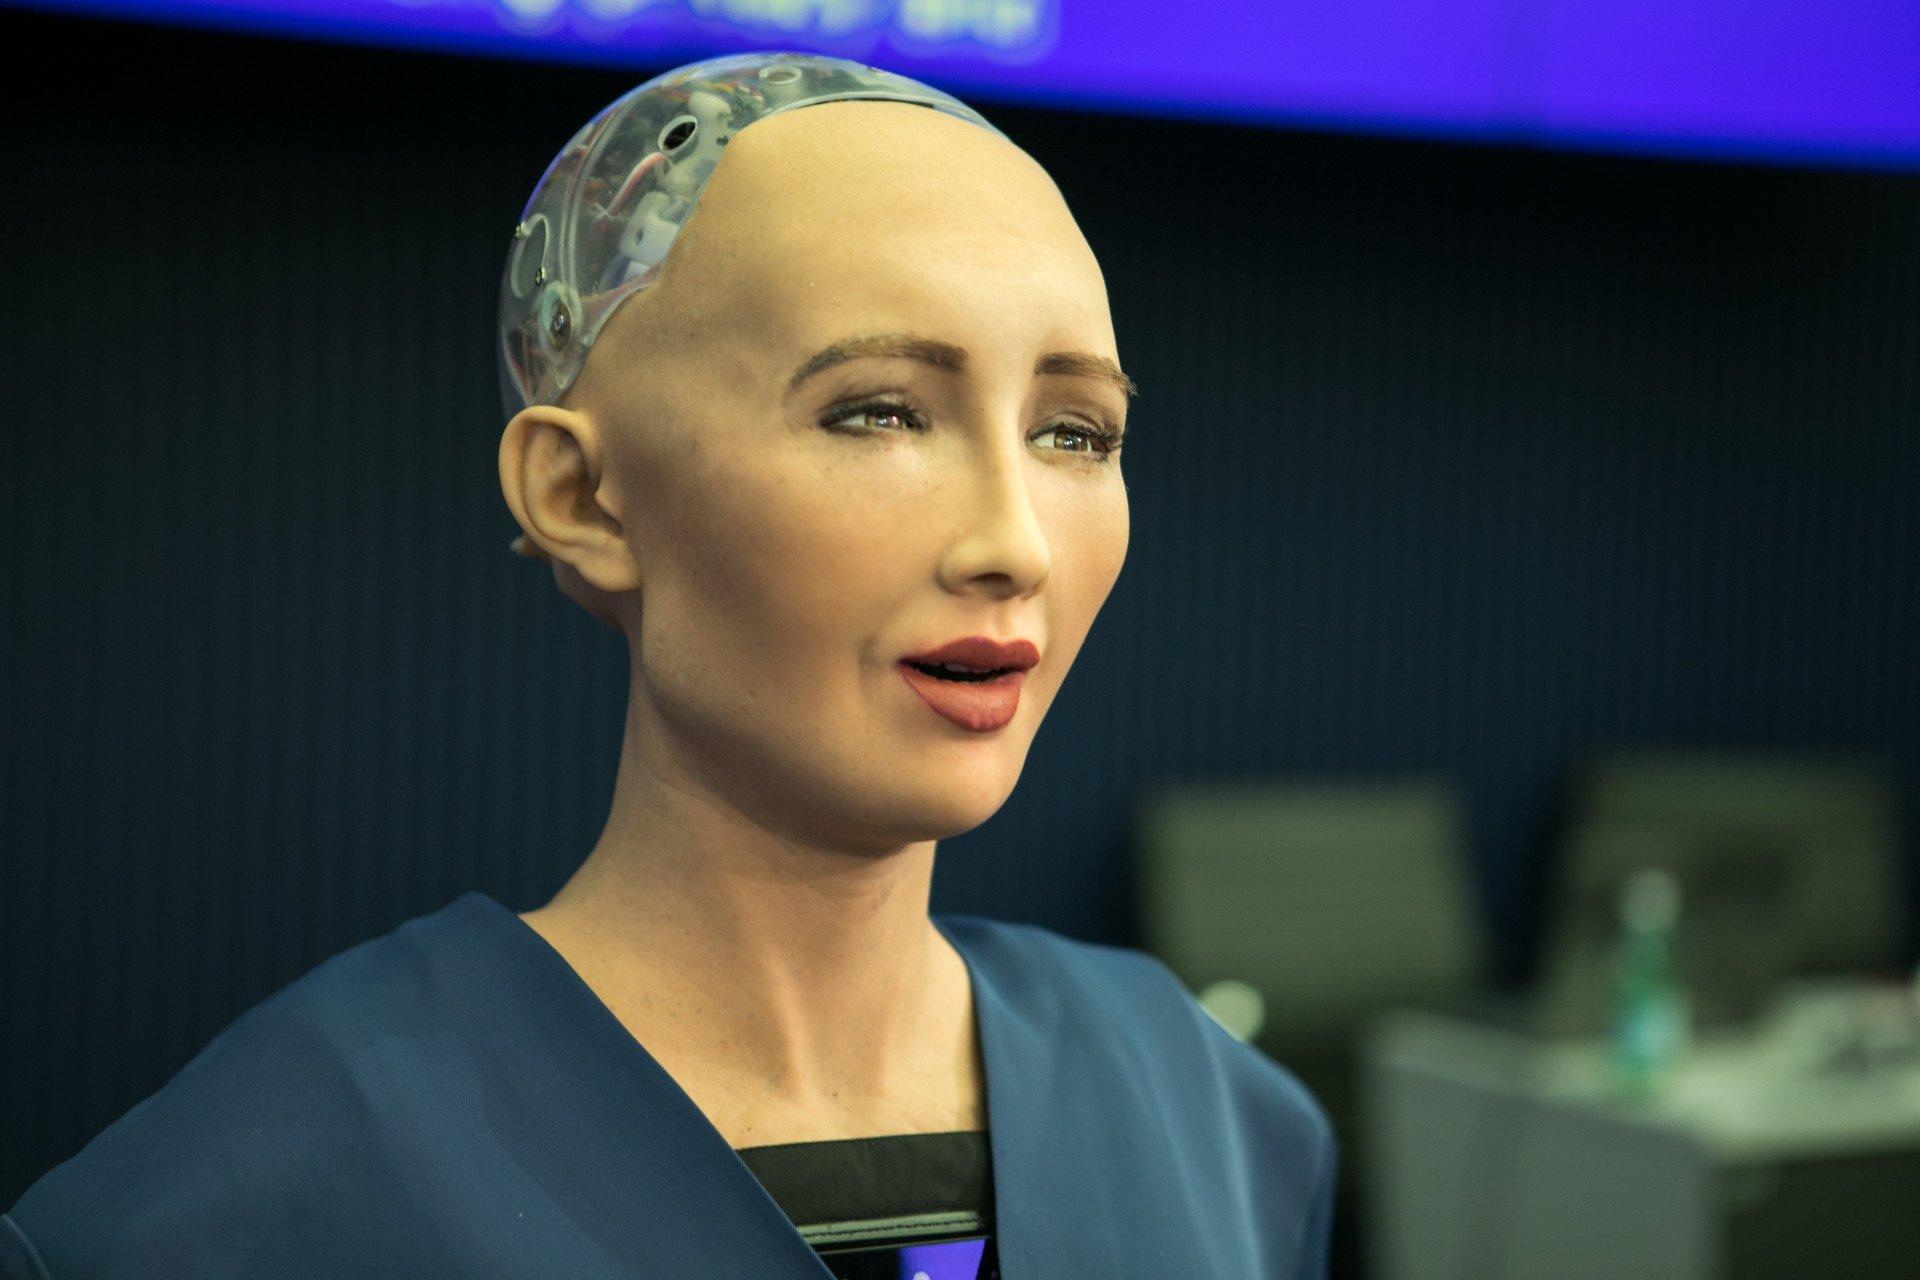 sztuczna inteligencja sophia